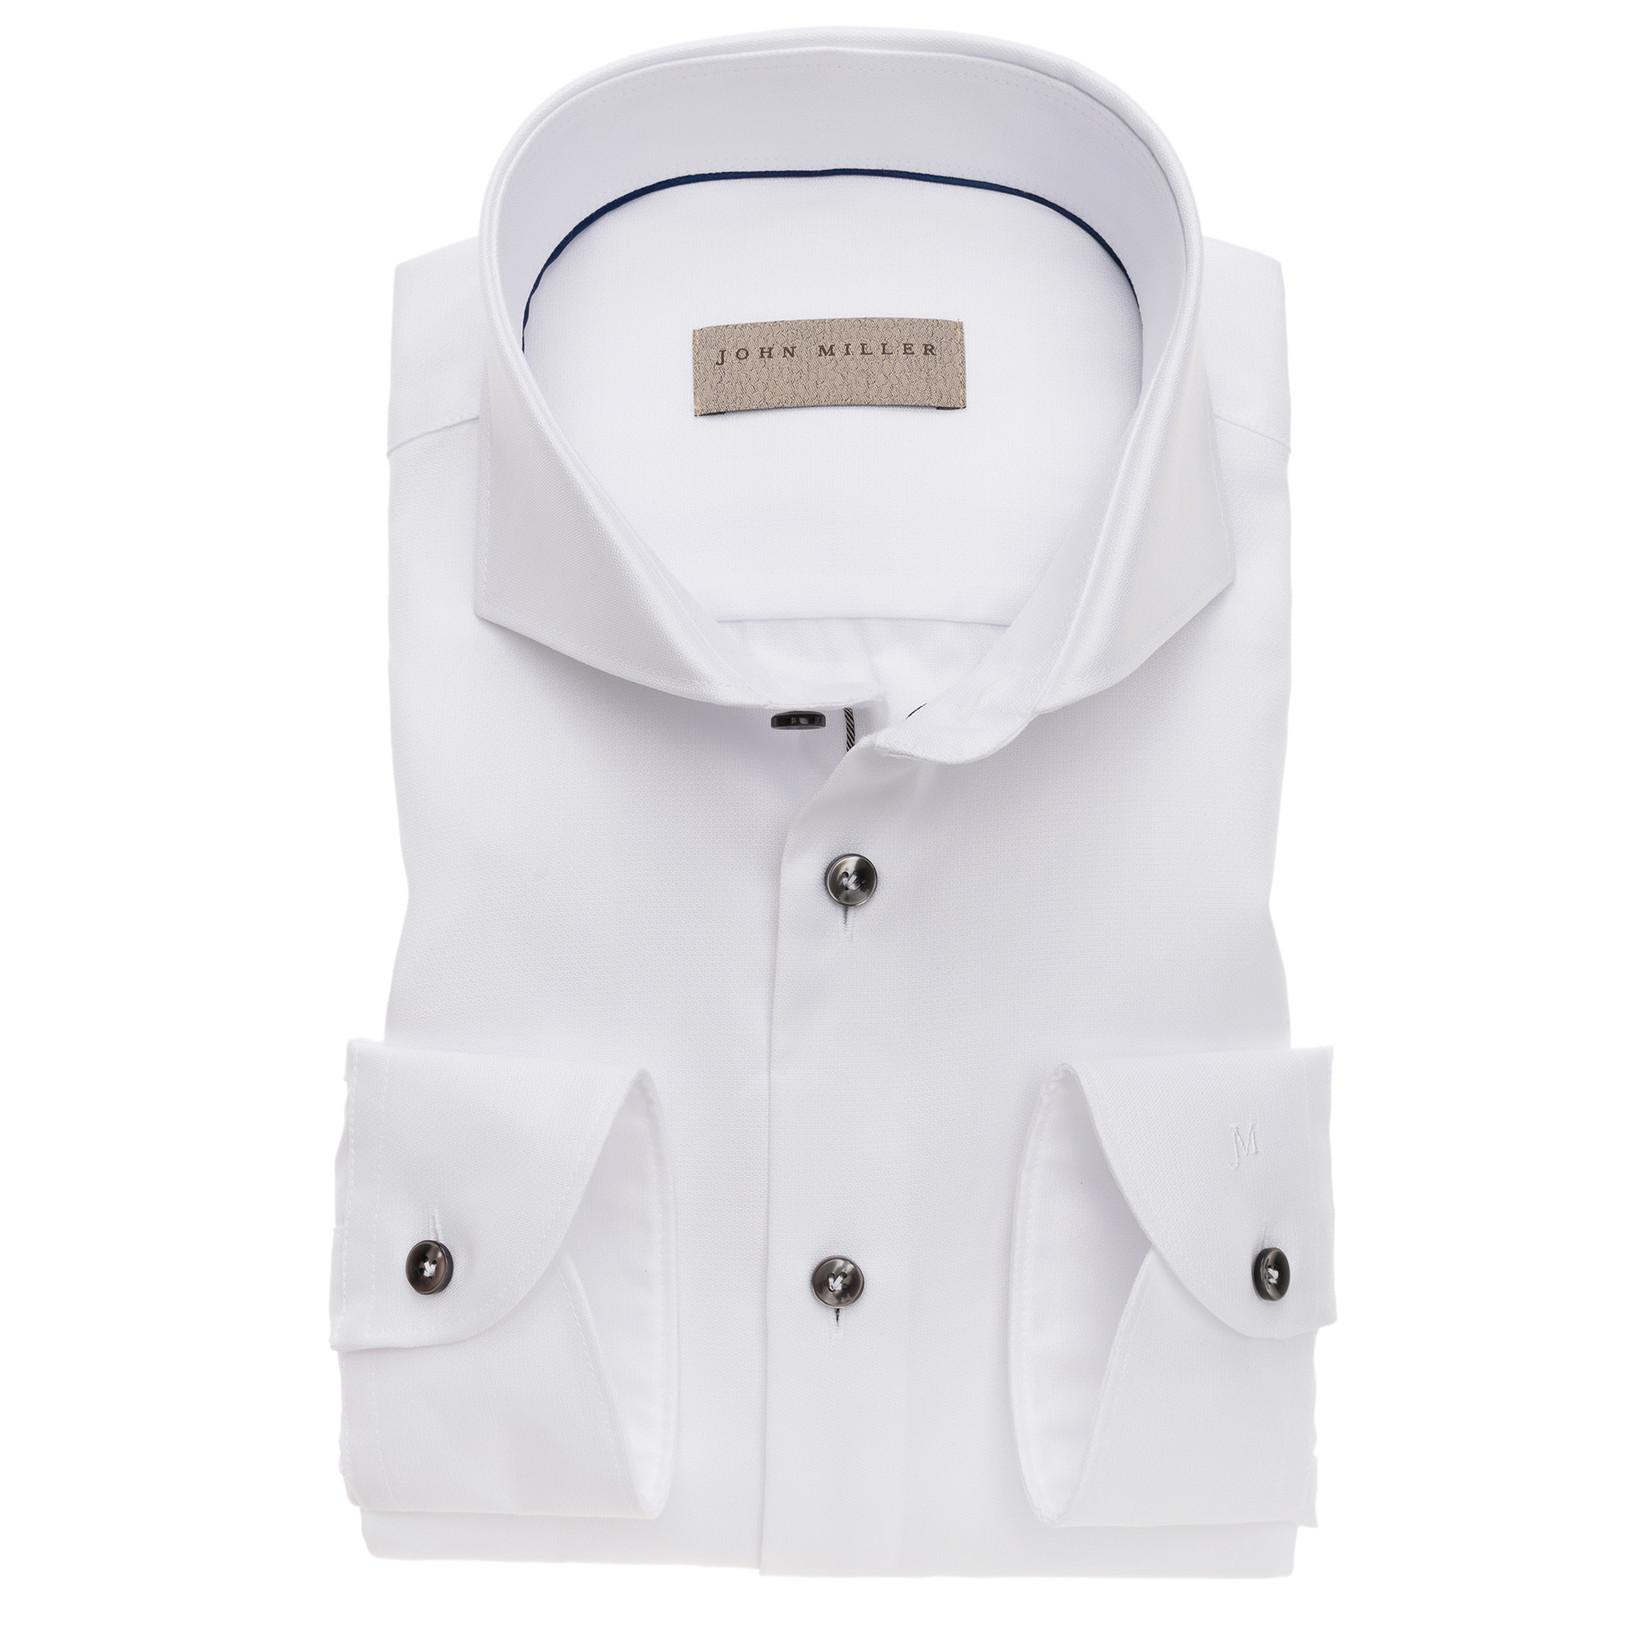 John Miller tailored fit overhemd wit met cut away boord